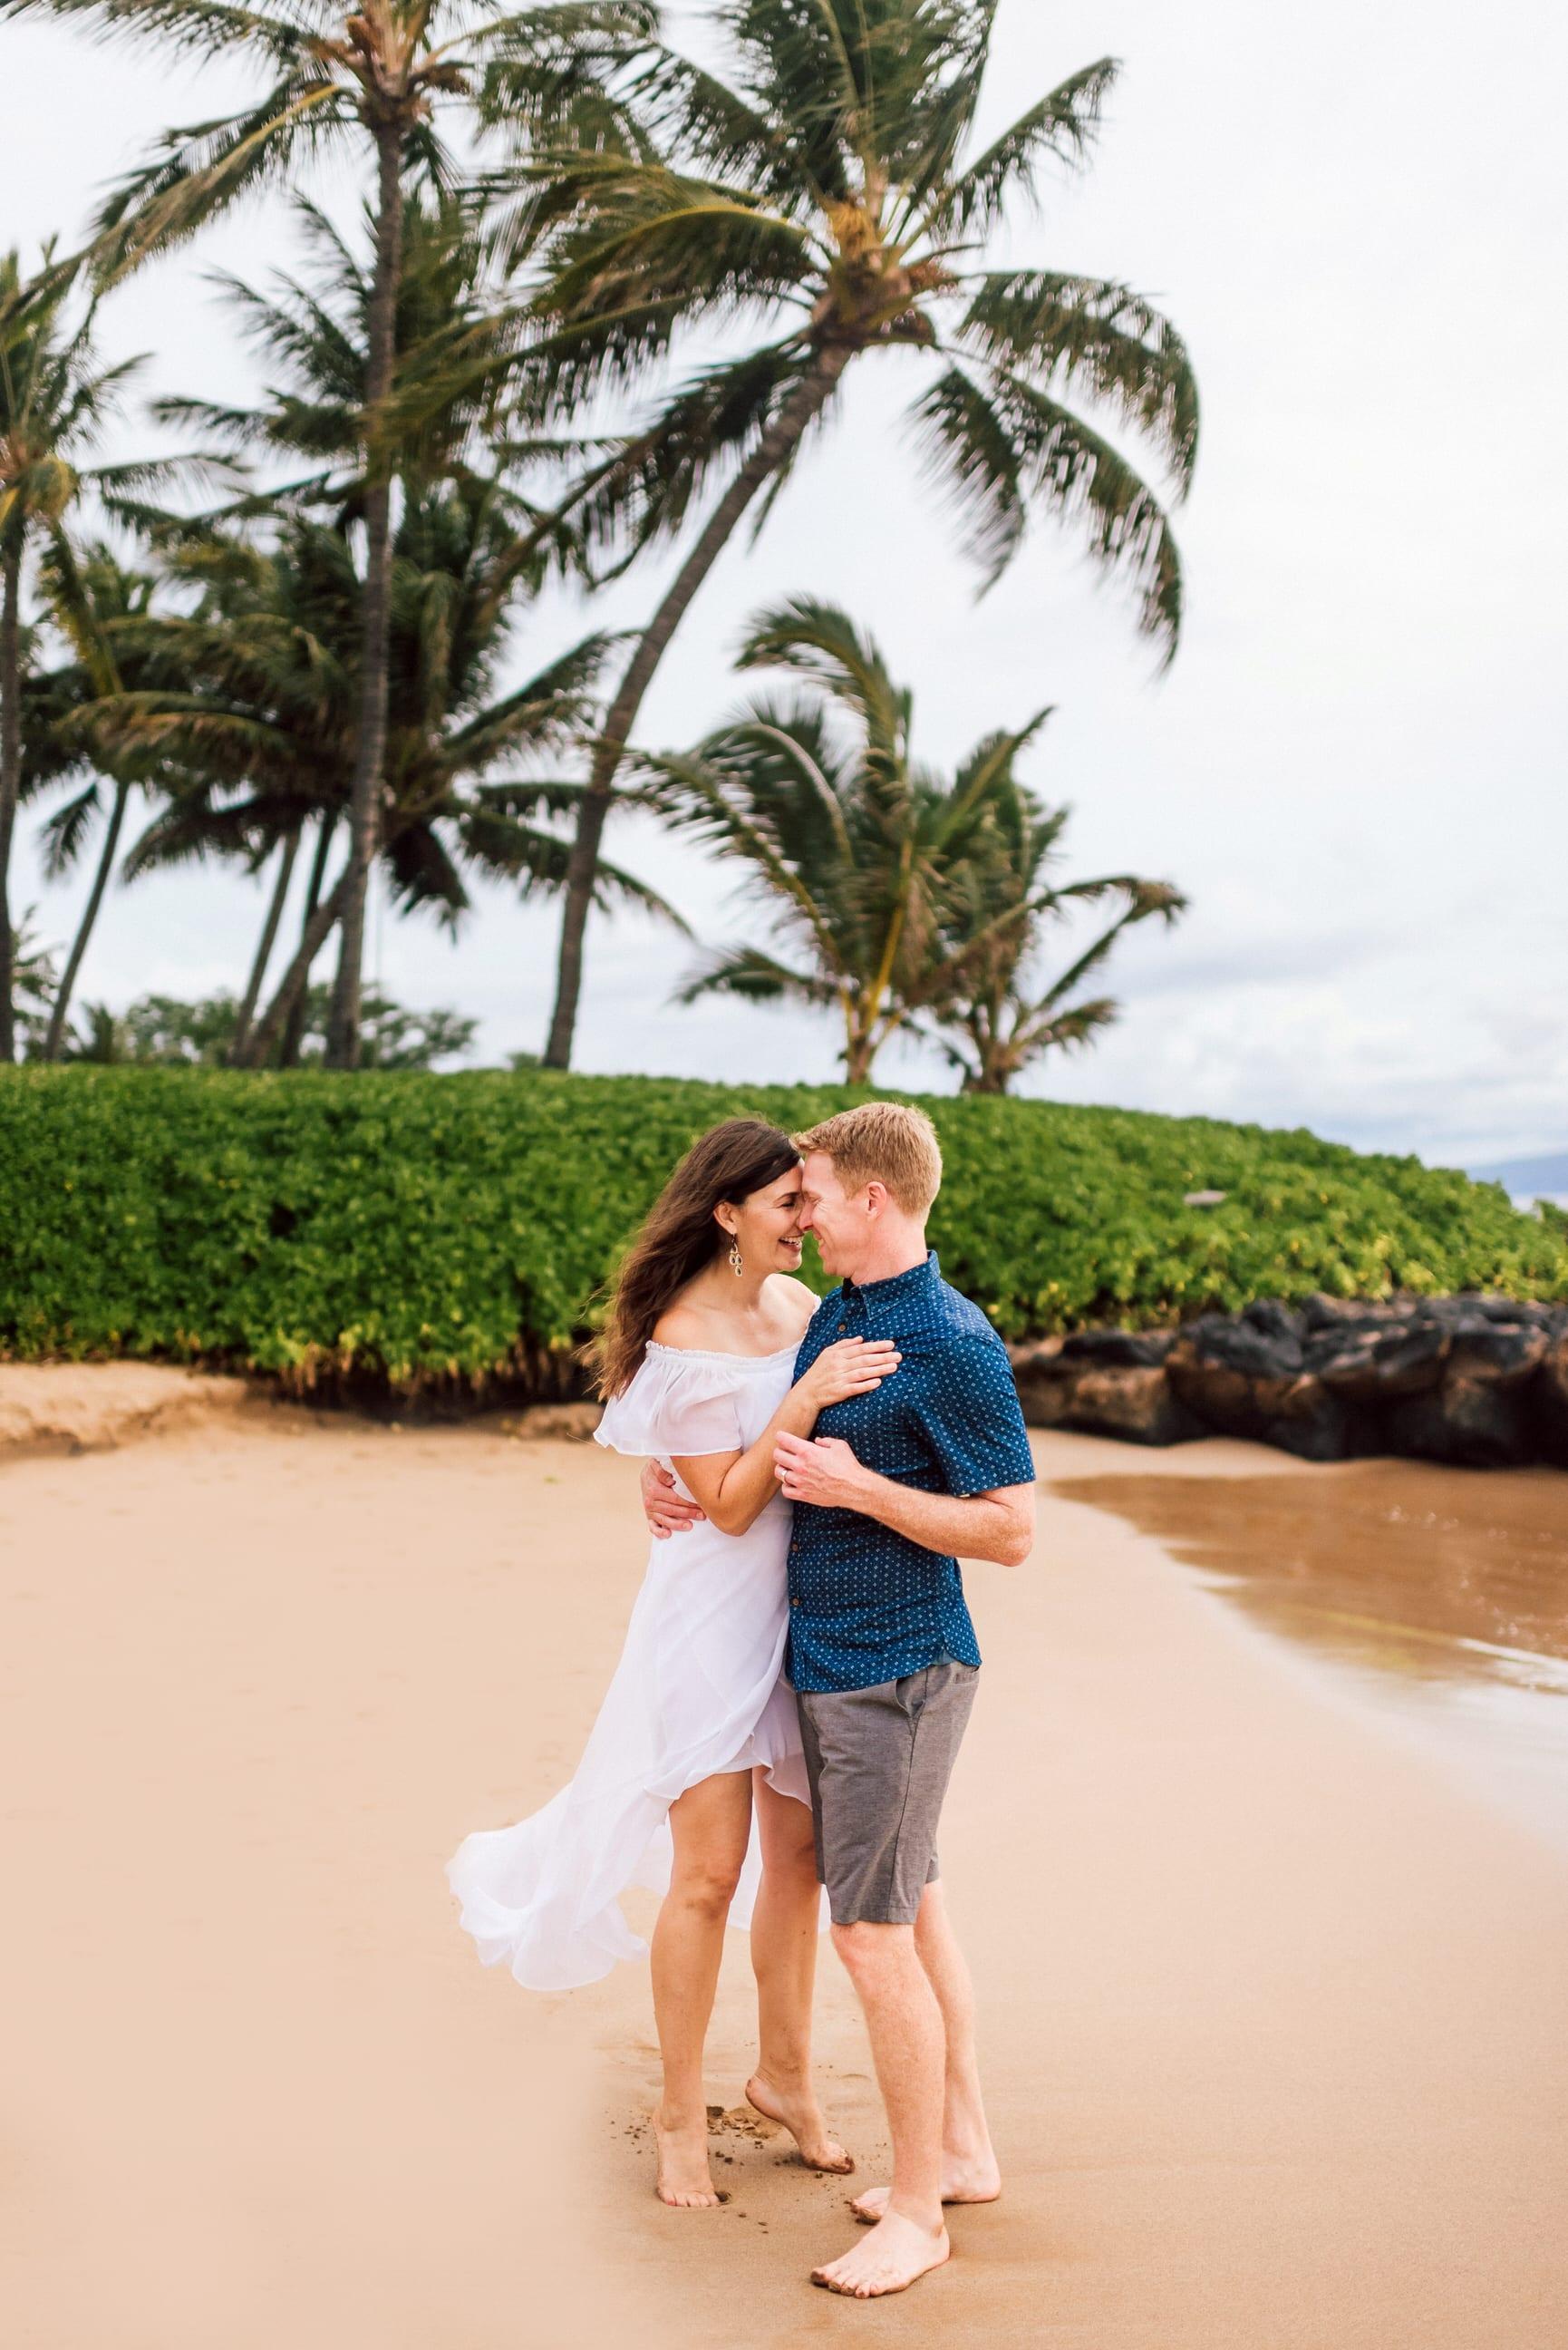 Love-Maui-Family-Photographer-Water-Hawaii-16.jpg